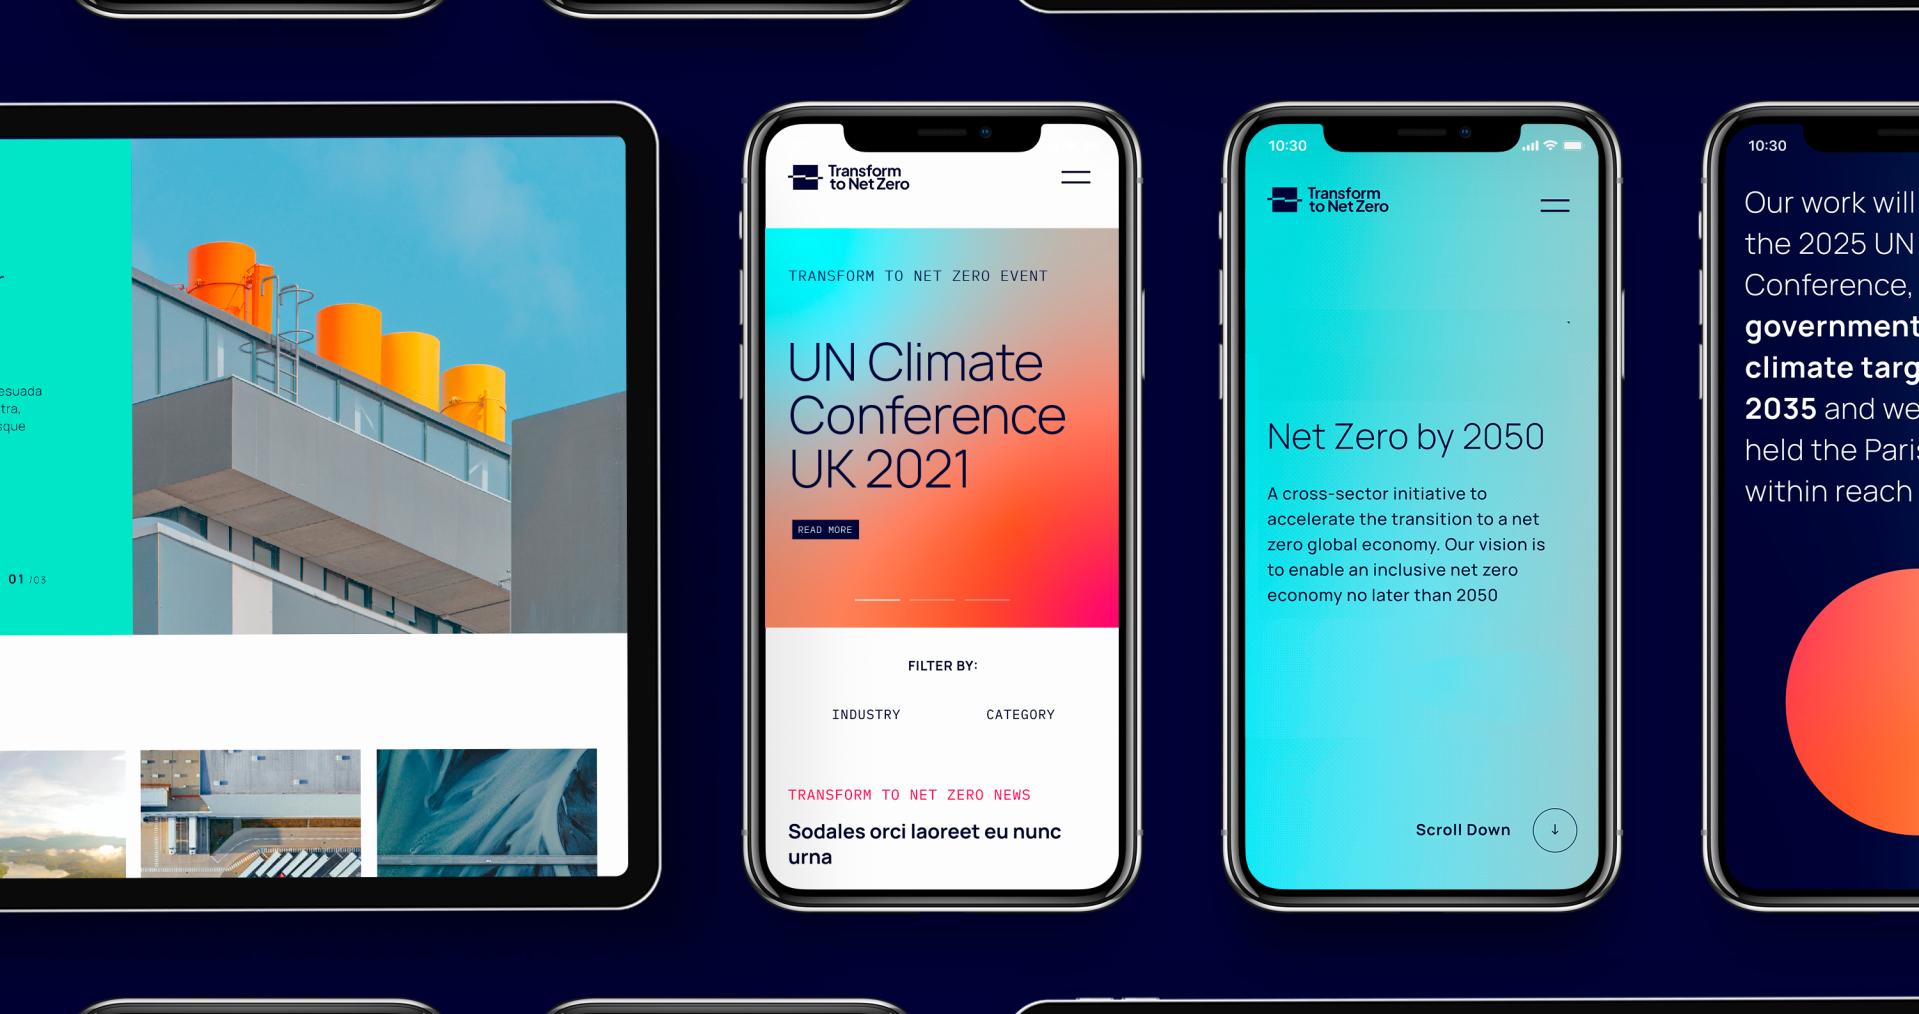 Transform To Net Zero - UI on mobile image